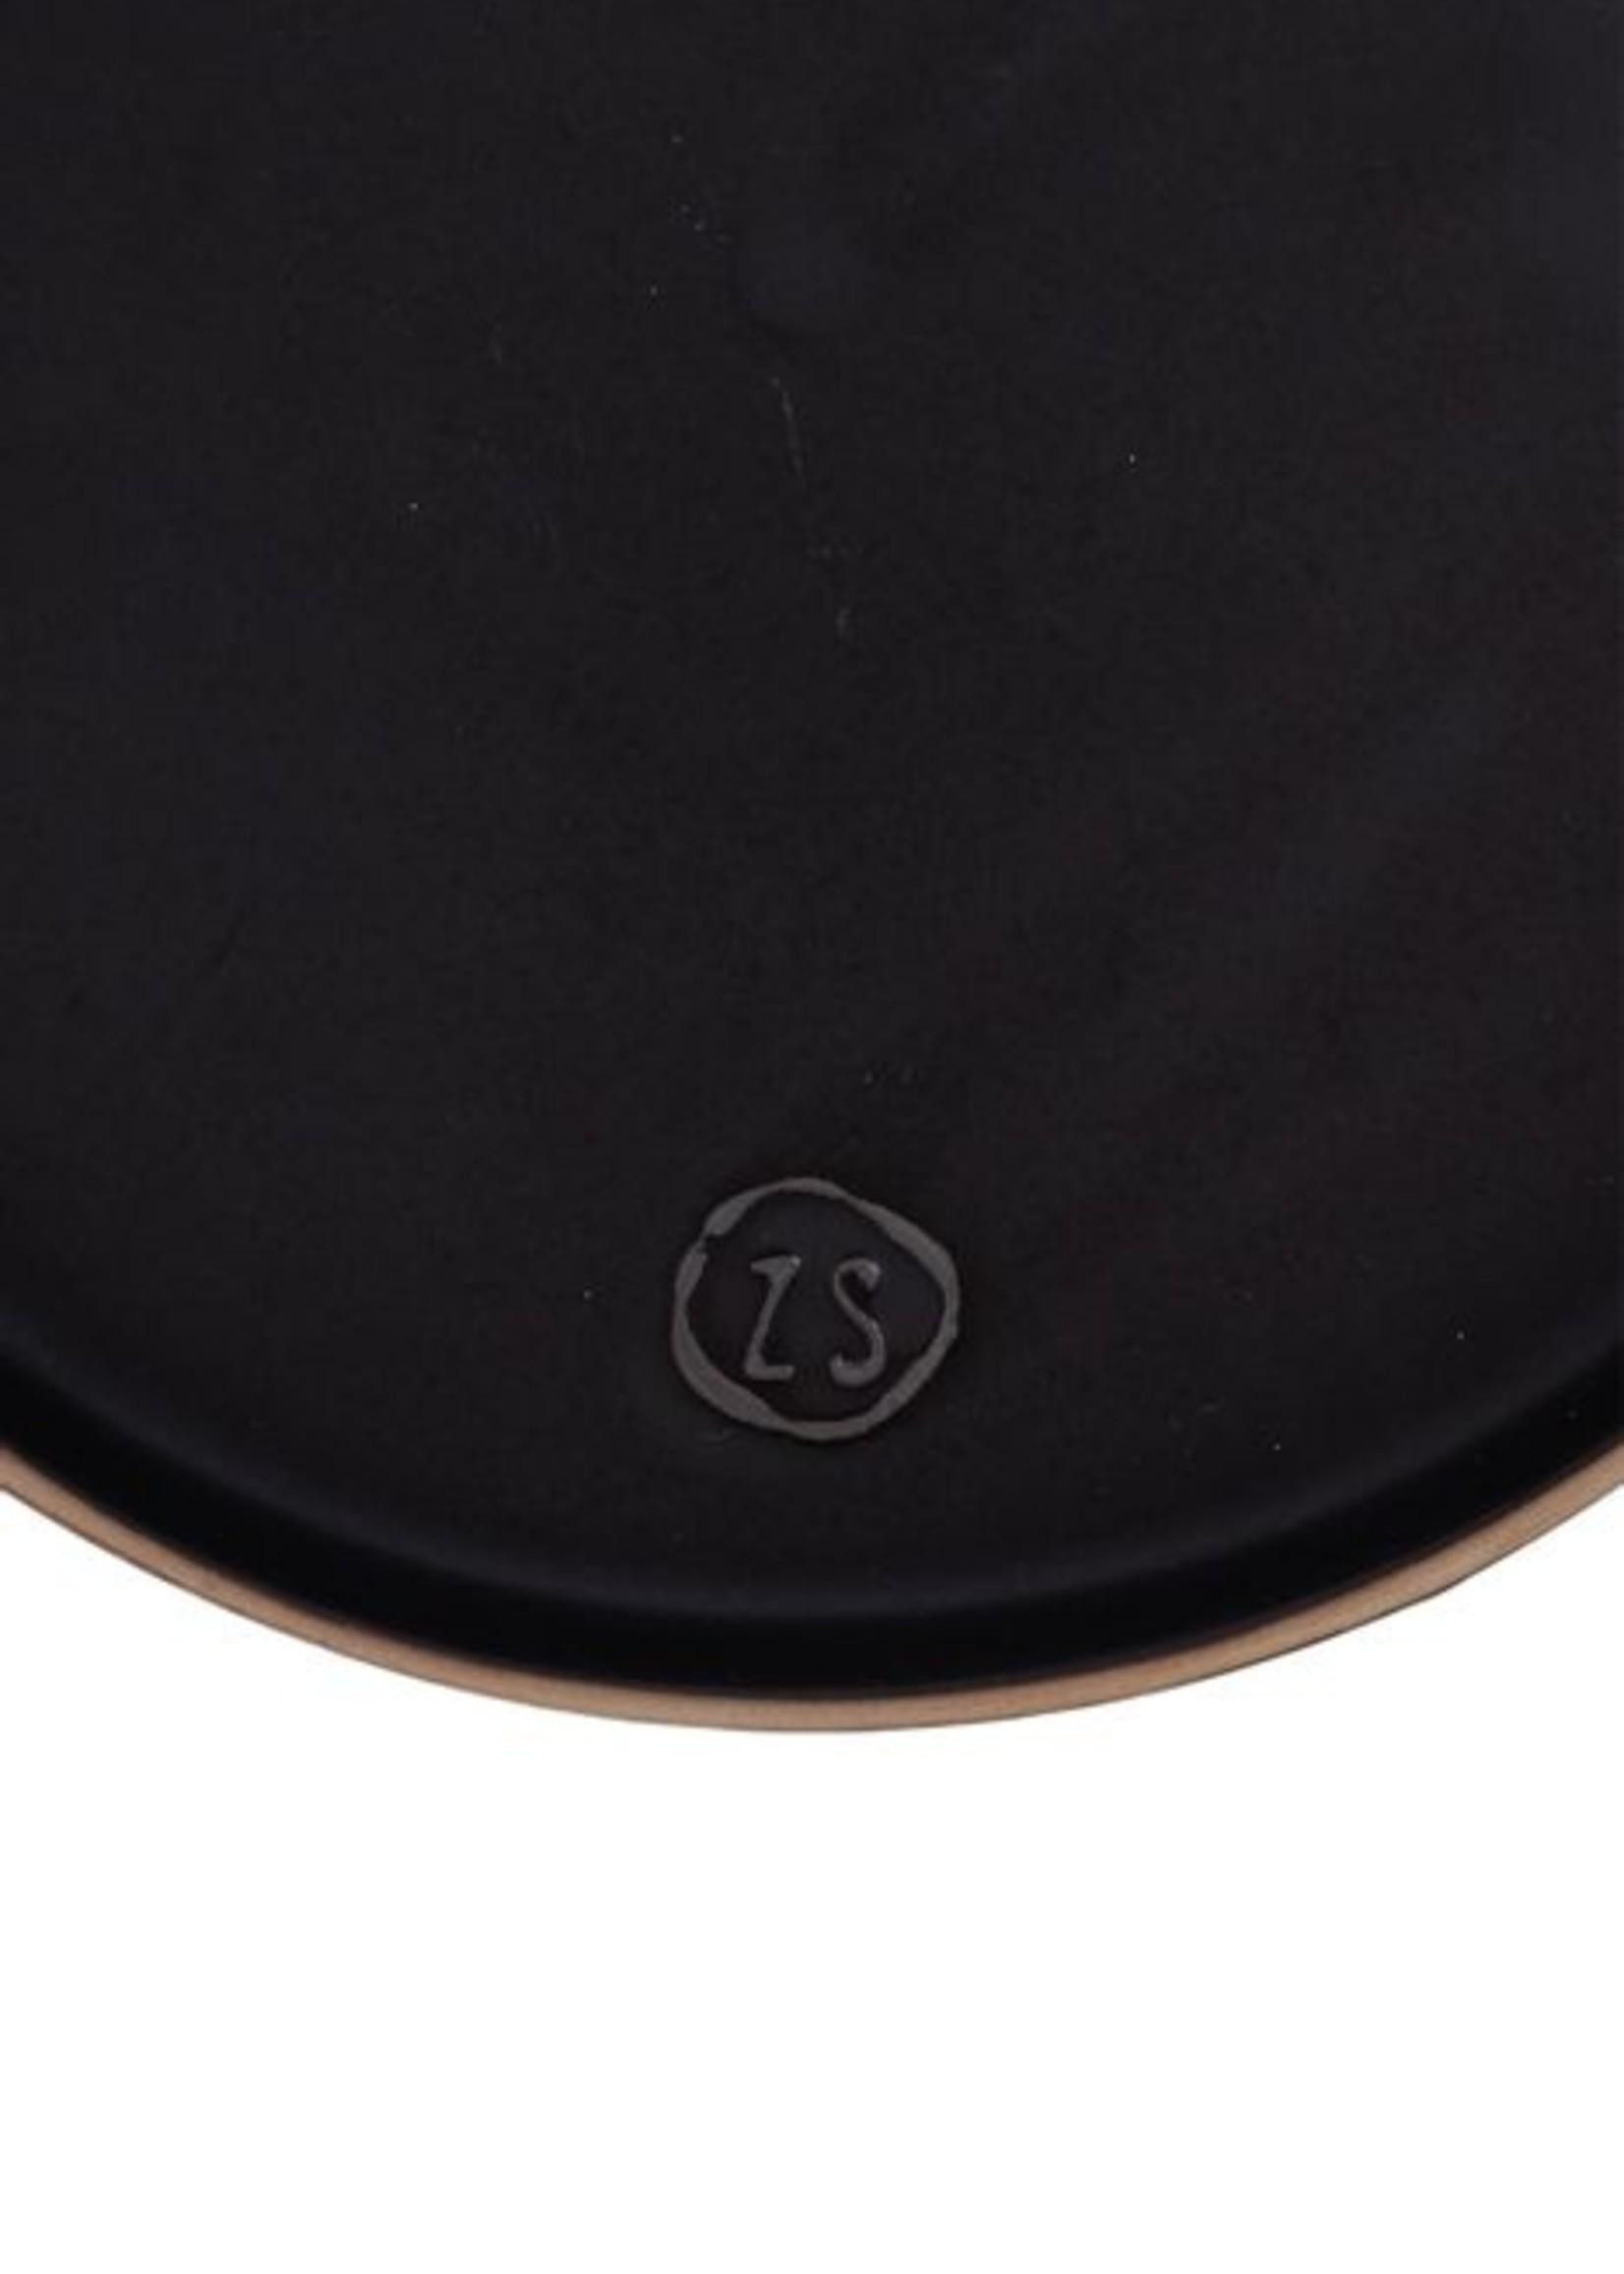 ZUSSS ontbijtbord aardewerk zwart